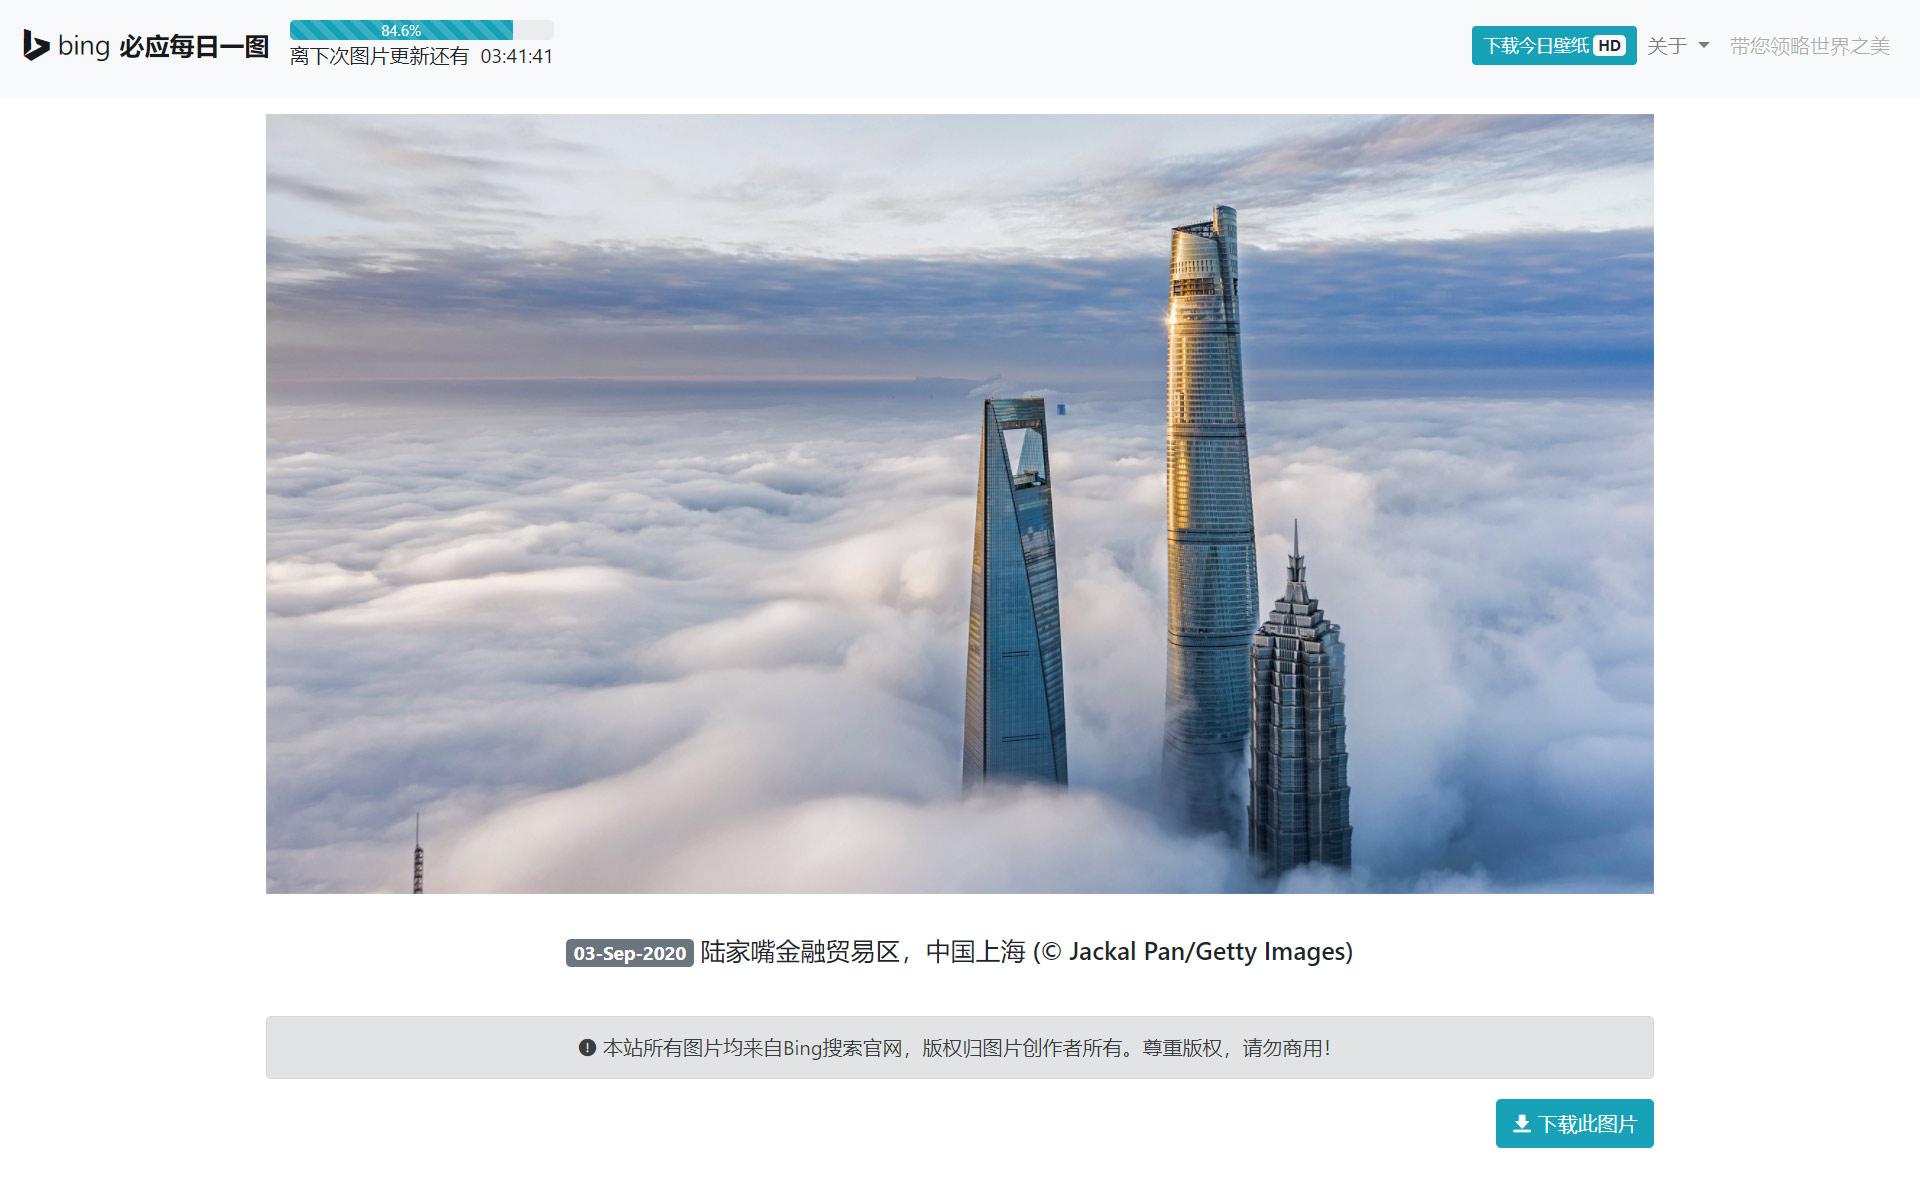 screenshot-bing.mcloc.cn-2020.09.09-20_19_38